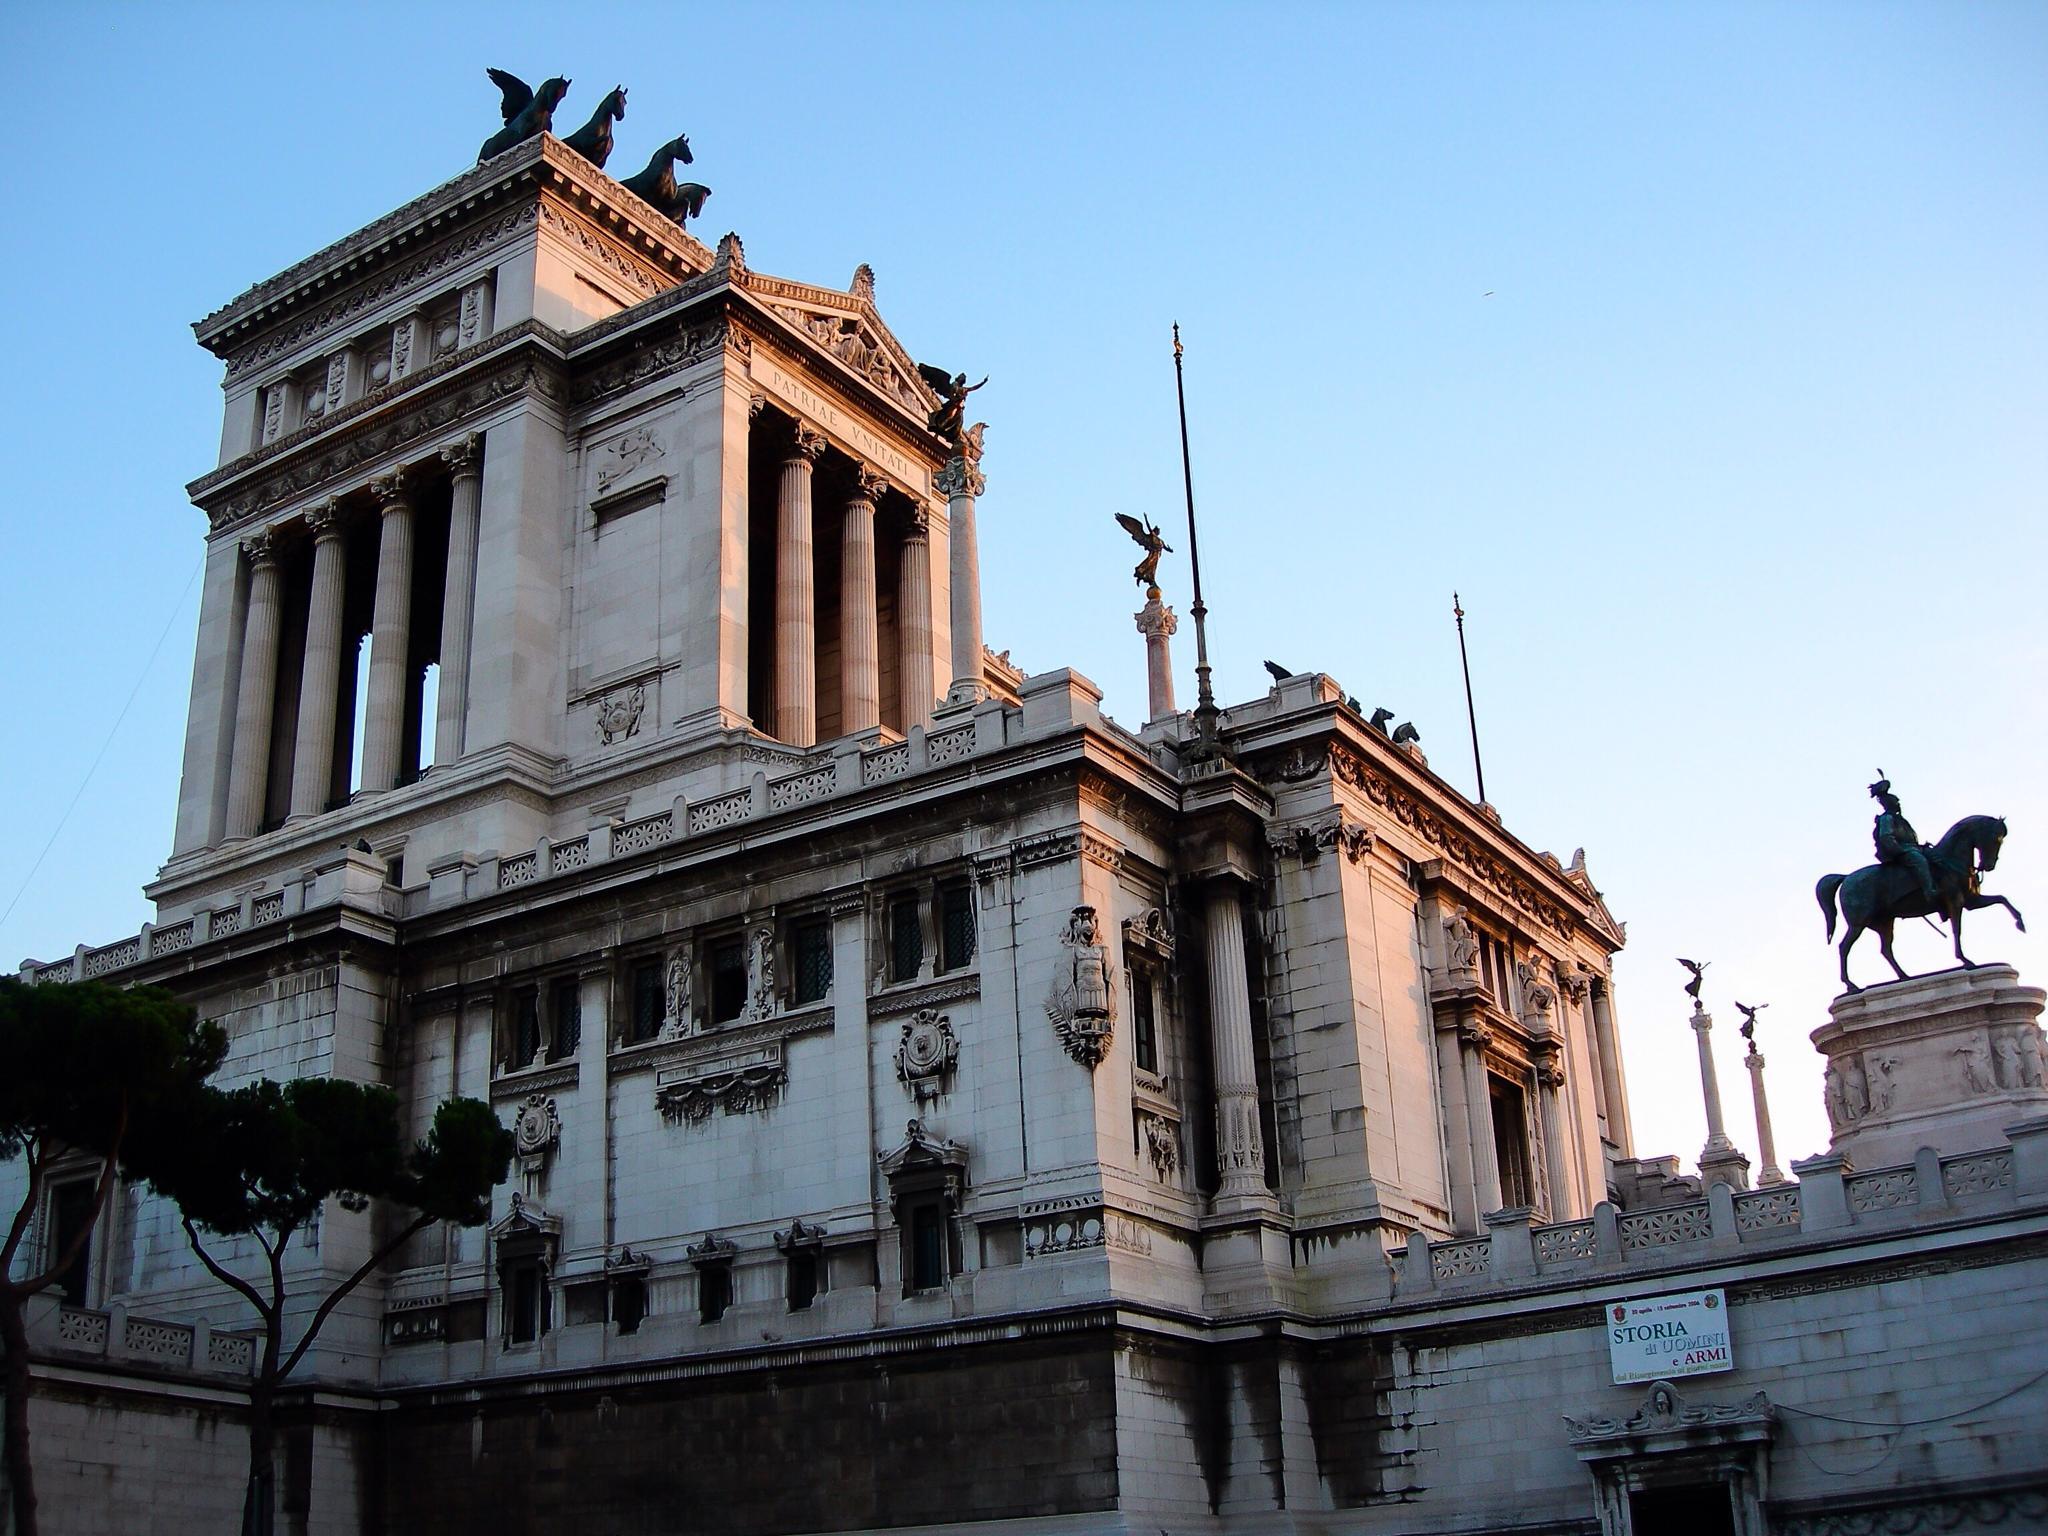 Monumento a Victor Manuel II, Altare della Patria (Roma - Italy) by Angel Alicarte Lopez